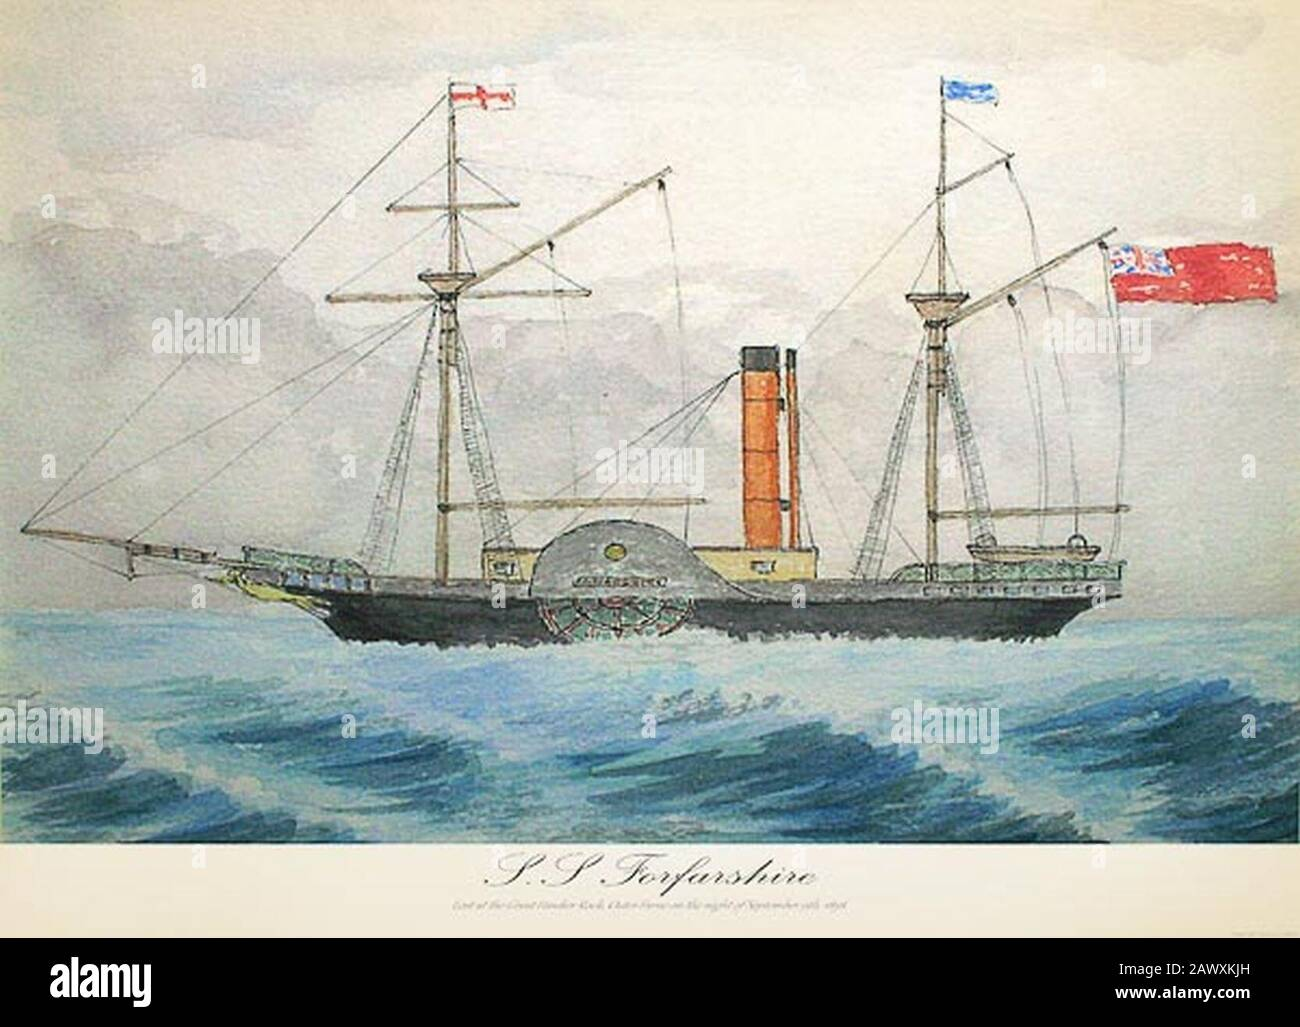 SS Forfarshire c1835. Stock Photo